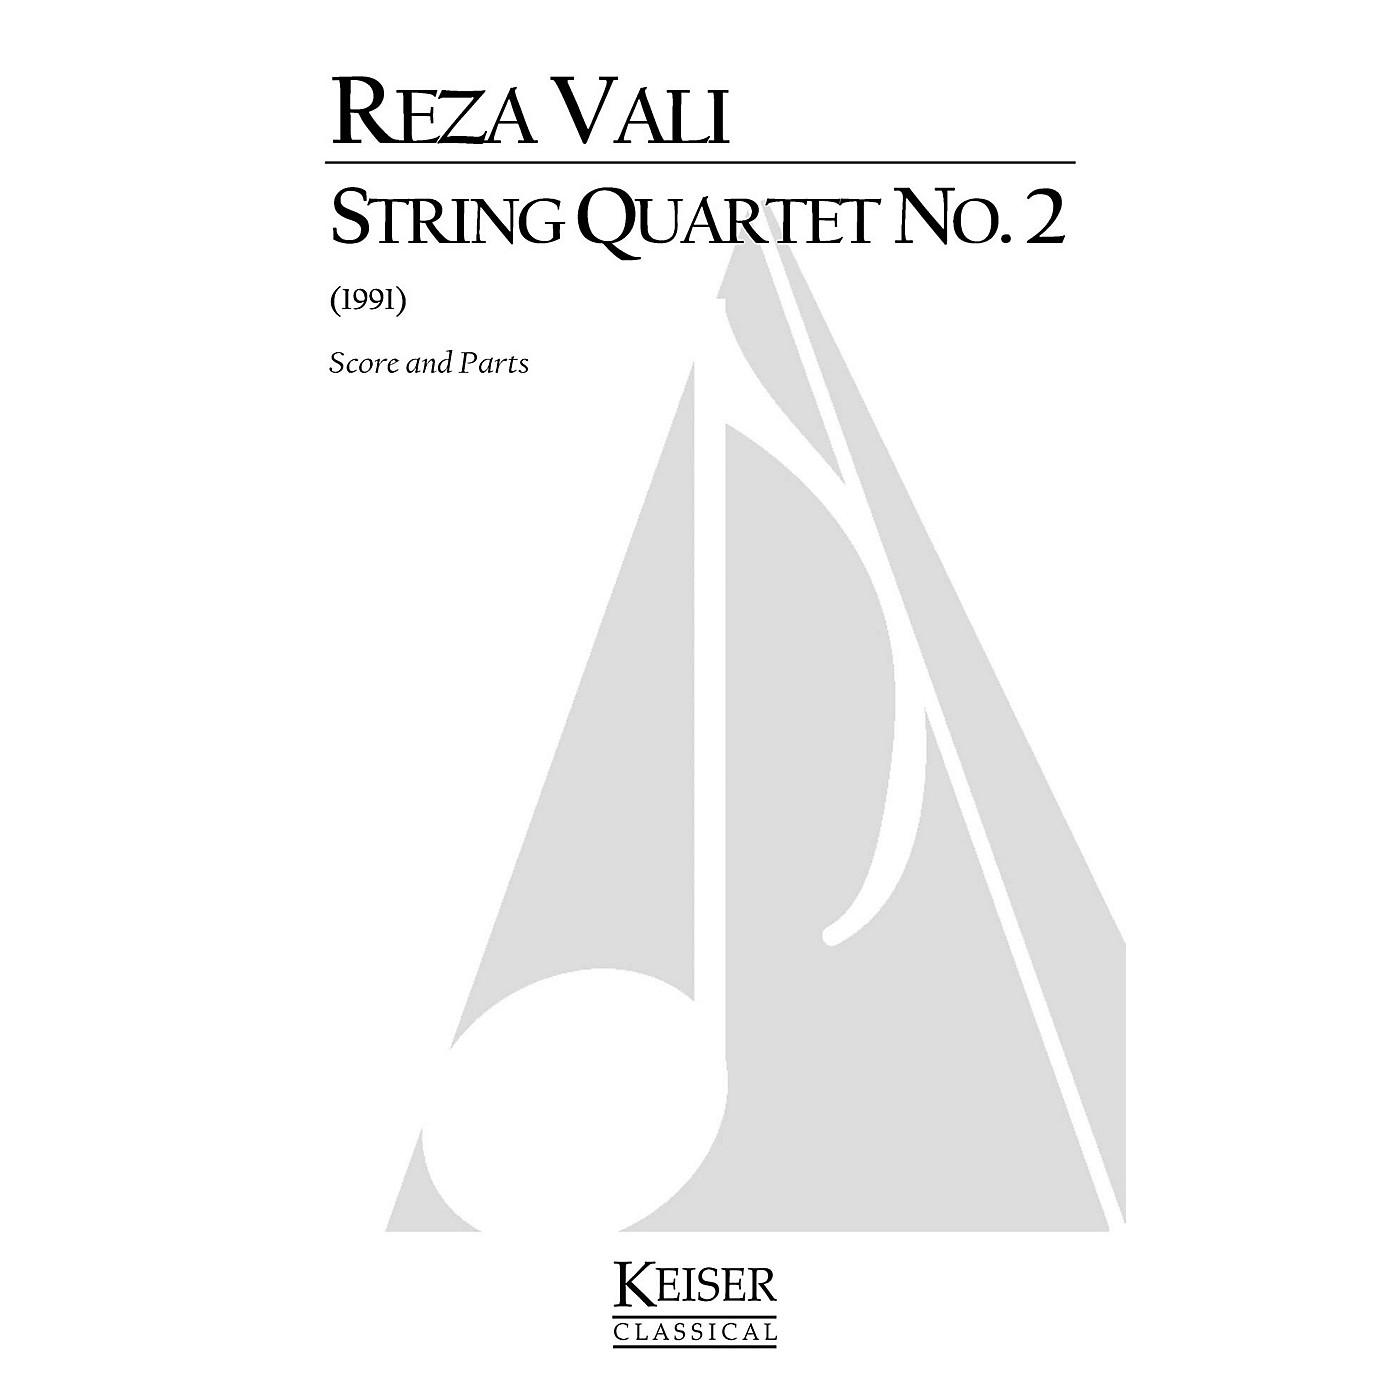 Lauren Keiser Music Publishing String Quartet No. 2 (Score and Parts) LKM Music Series by Reza Vali thumbnail